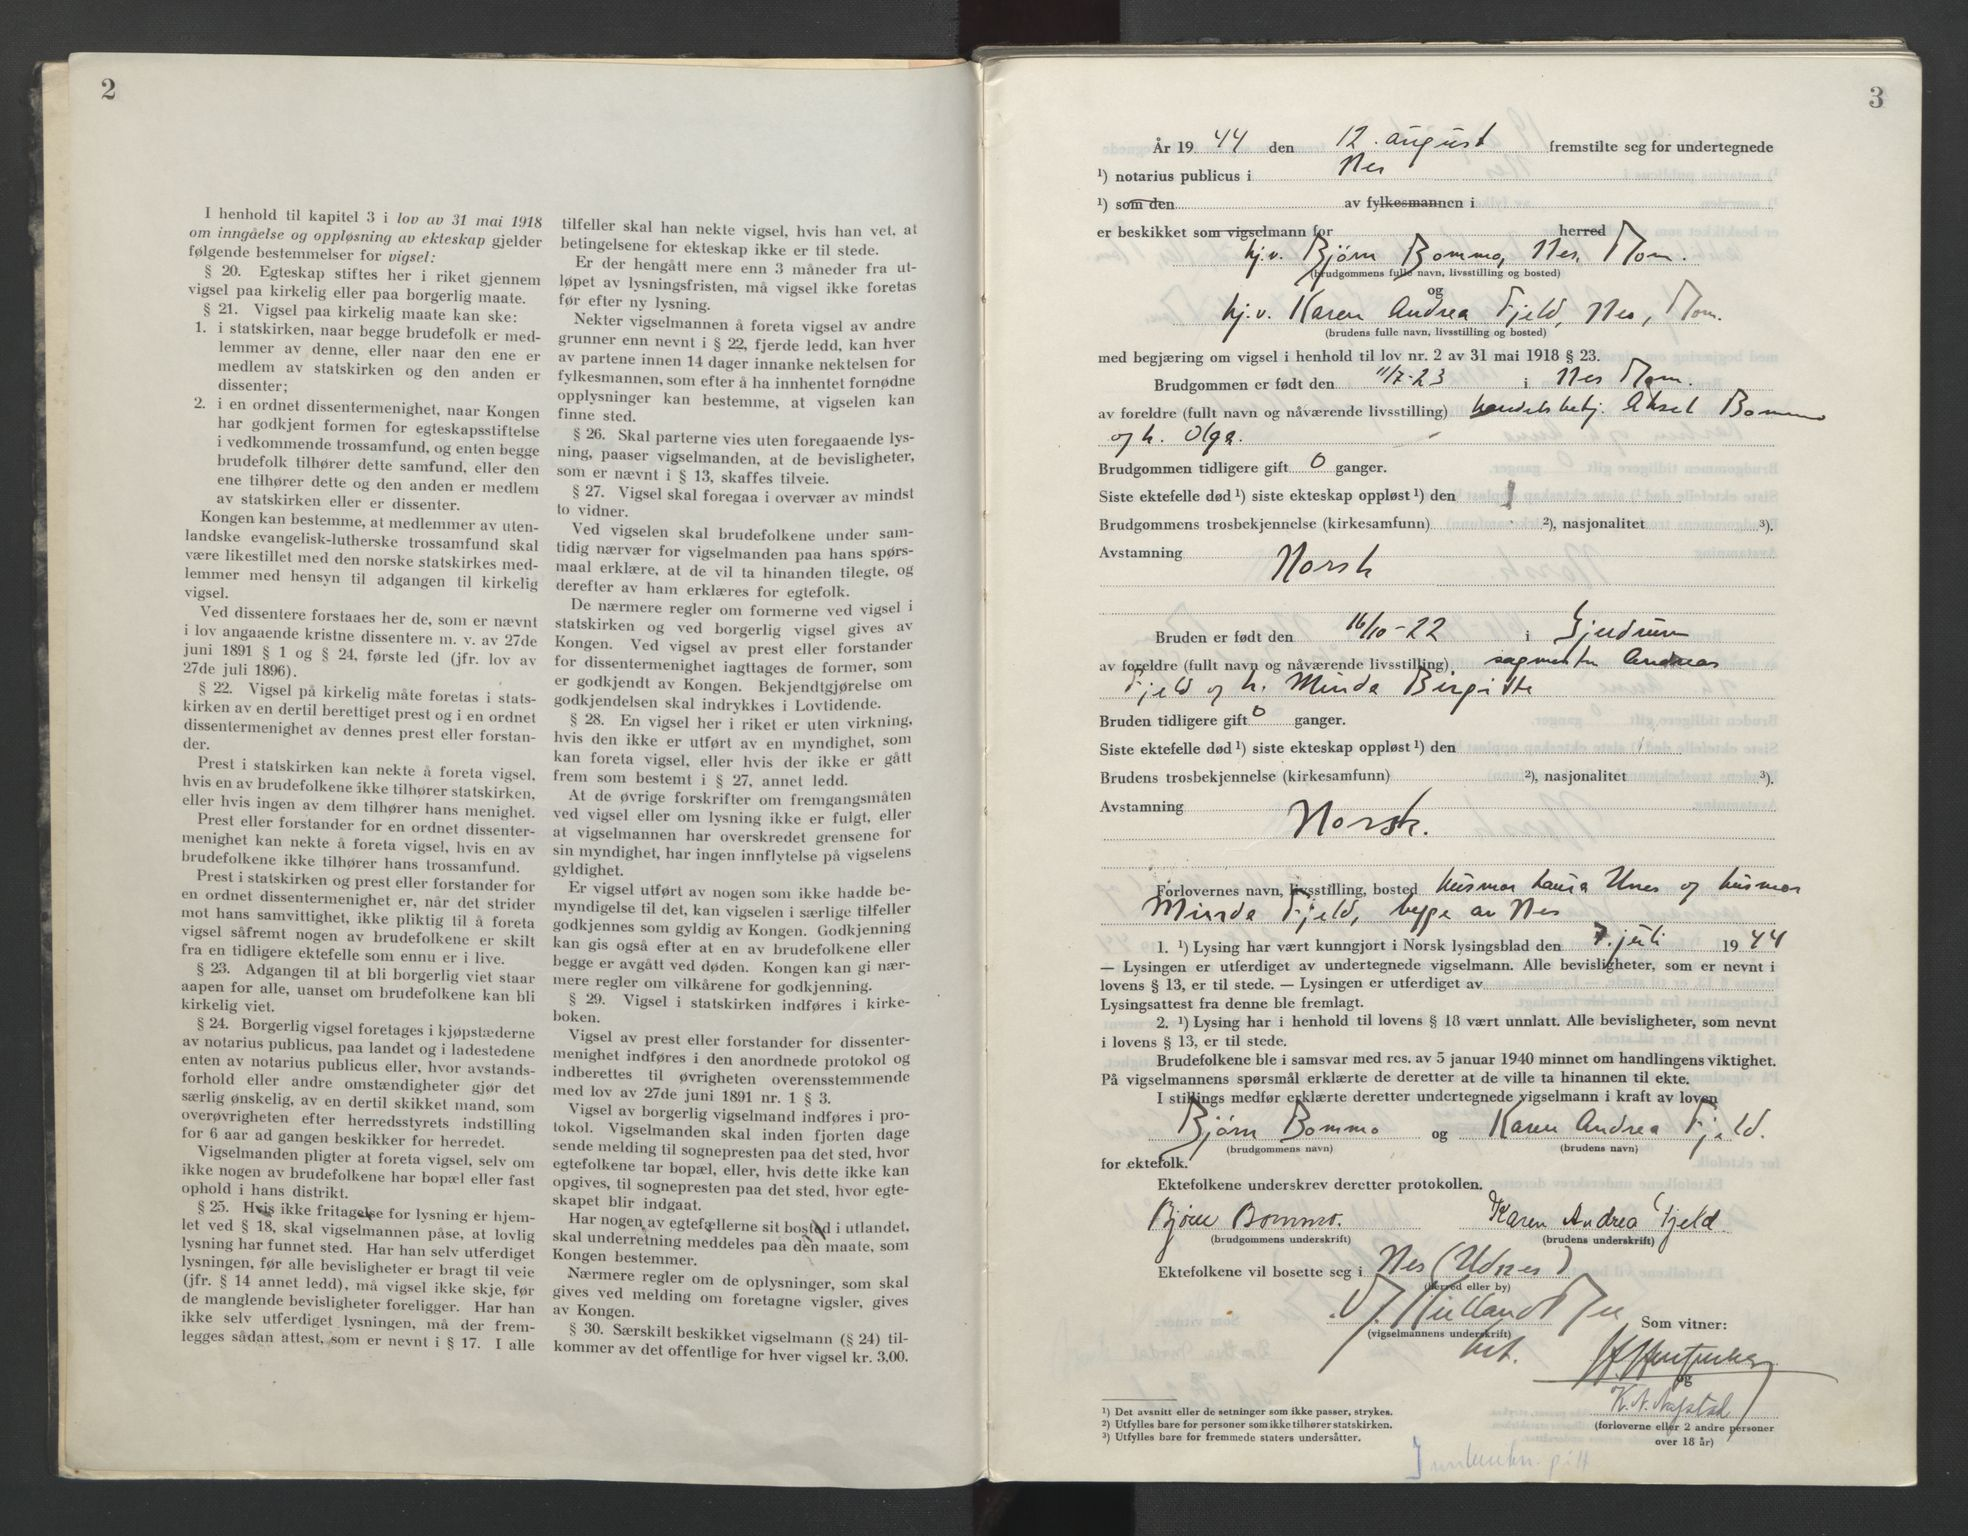 SAO, Nes tingrett, L/Lc/Lca/L0003: Vigselbok, 1944-1953, s. 2-3